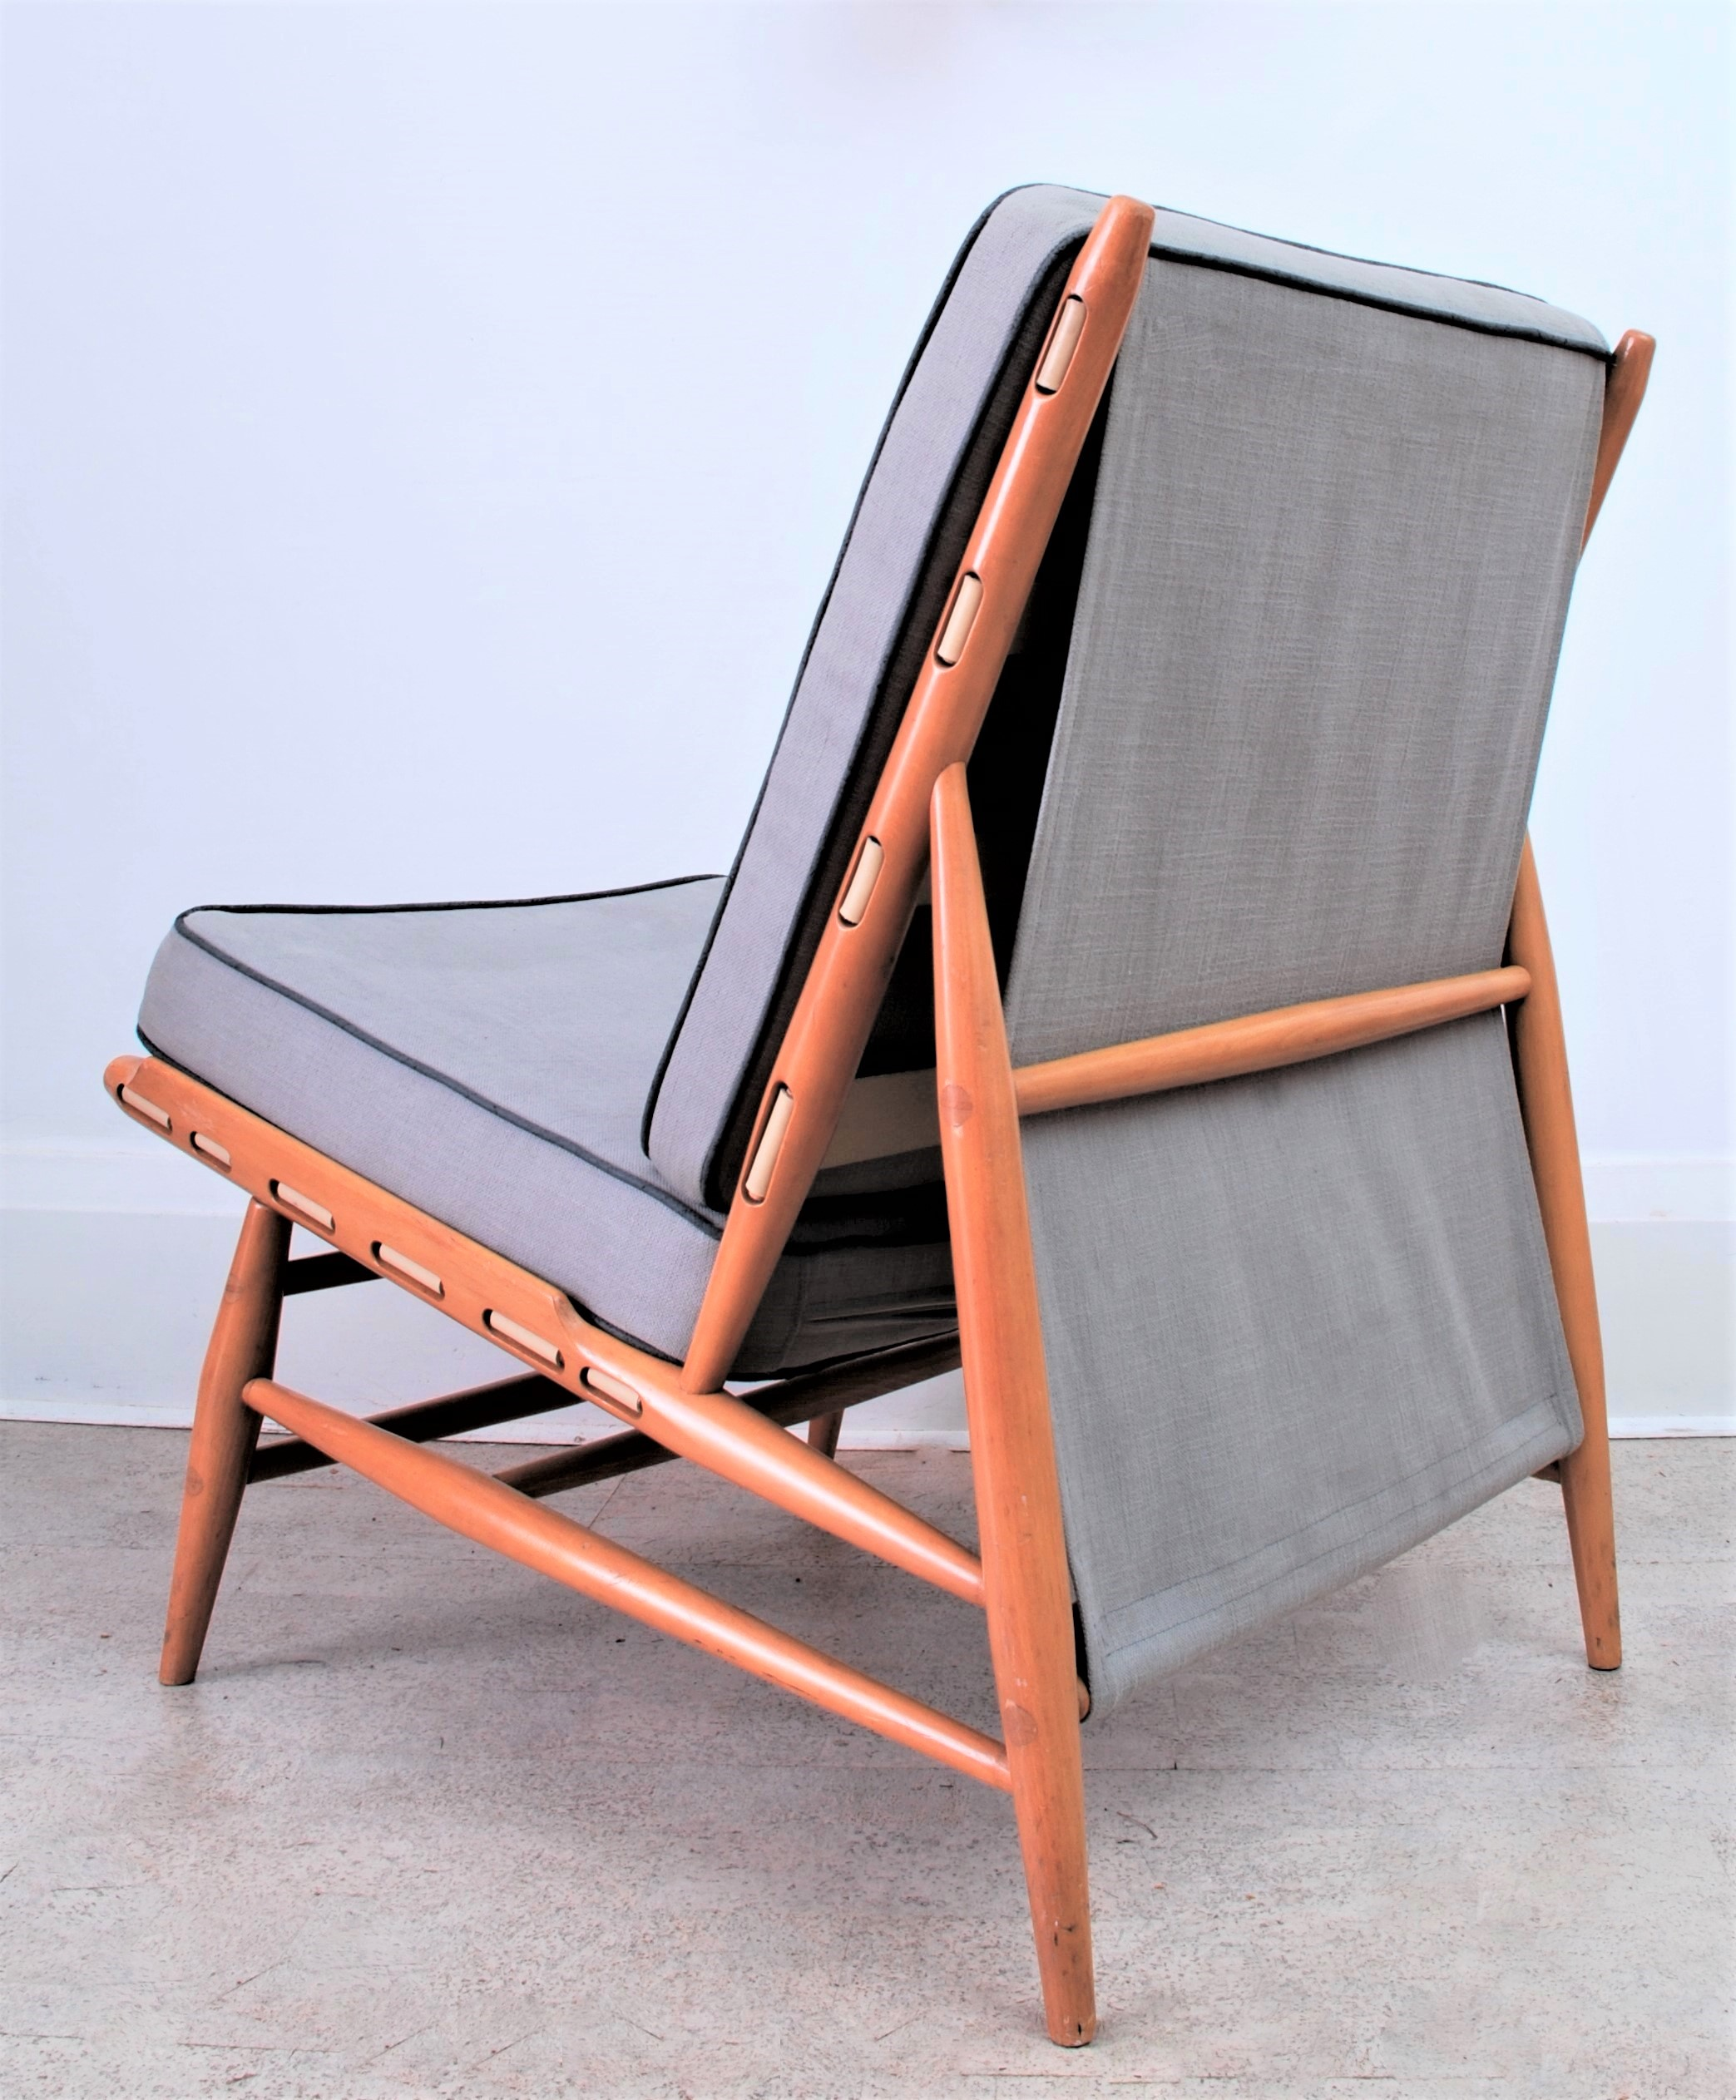 Ercol 427 Modular Lounge Chair (4)